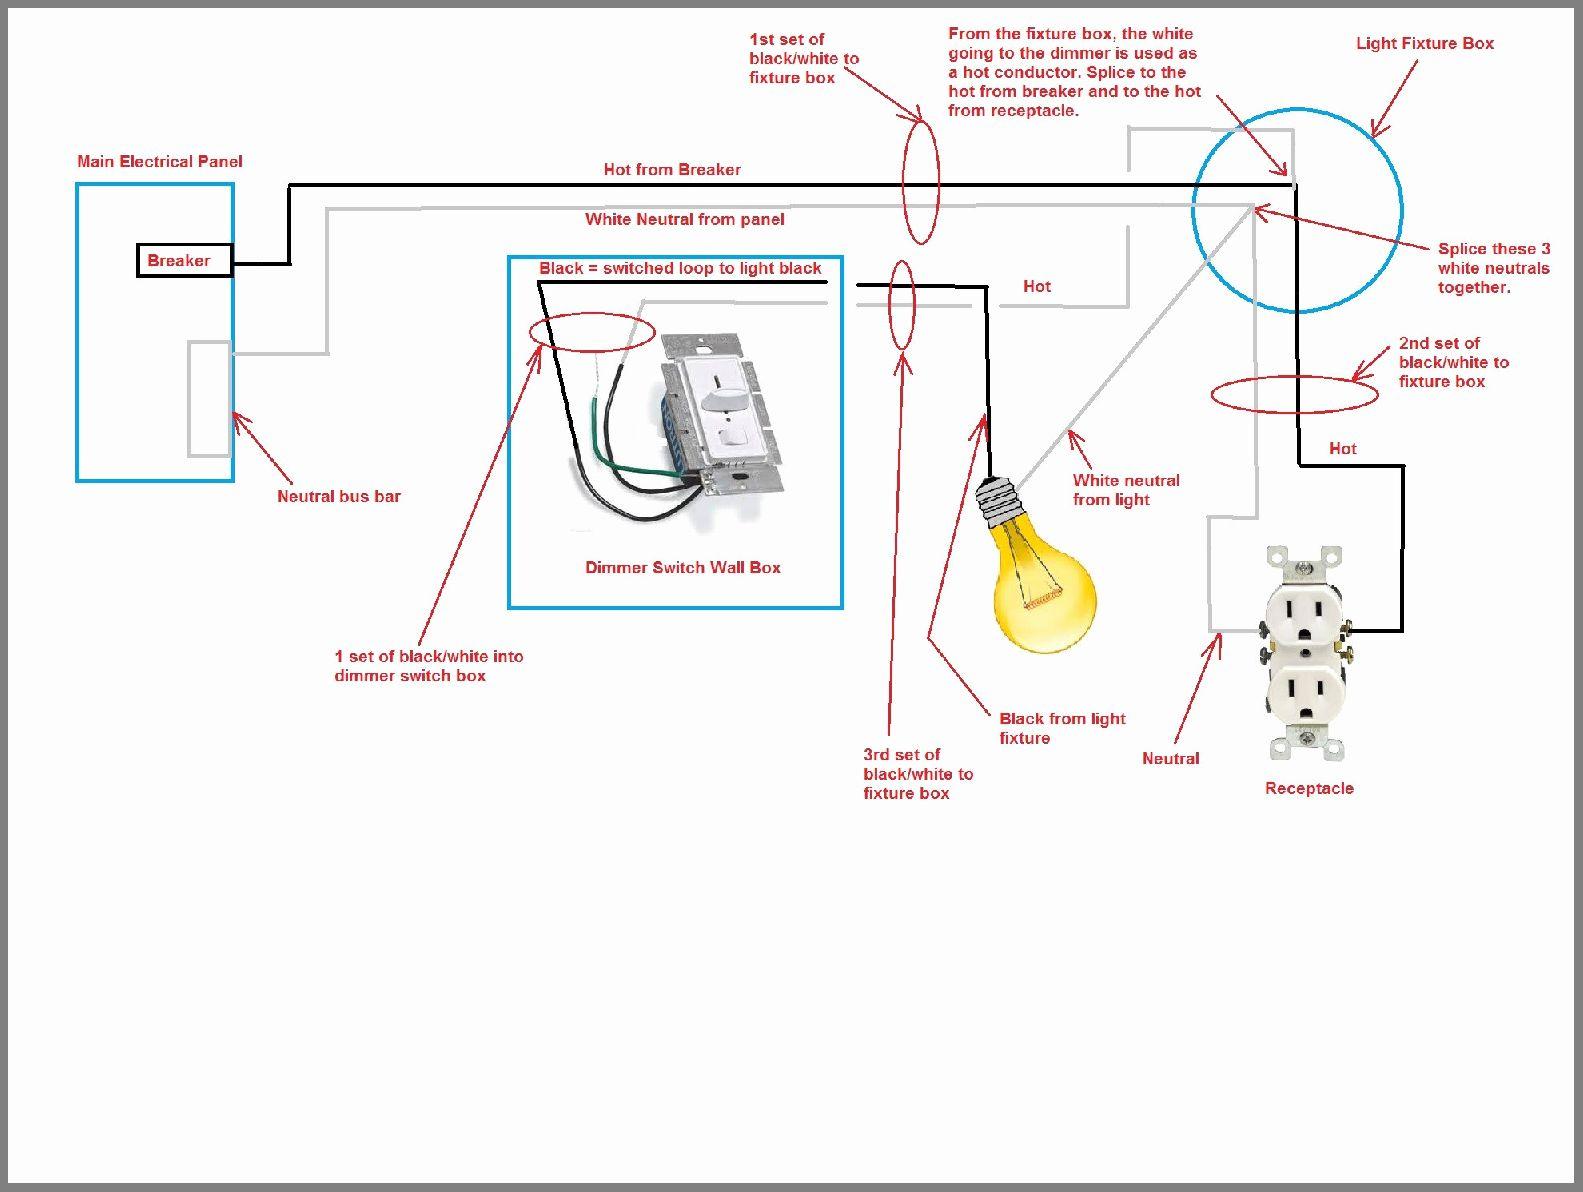 Wiring Diagrams For Black Fixtures | Schematic Diagram - Light Fixture Wiring Diagram